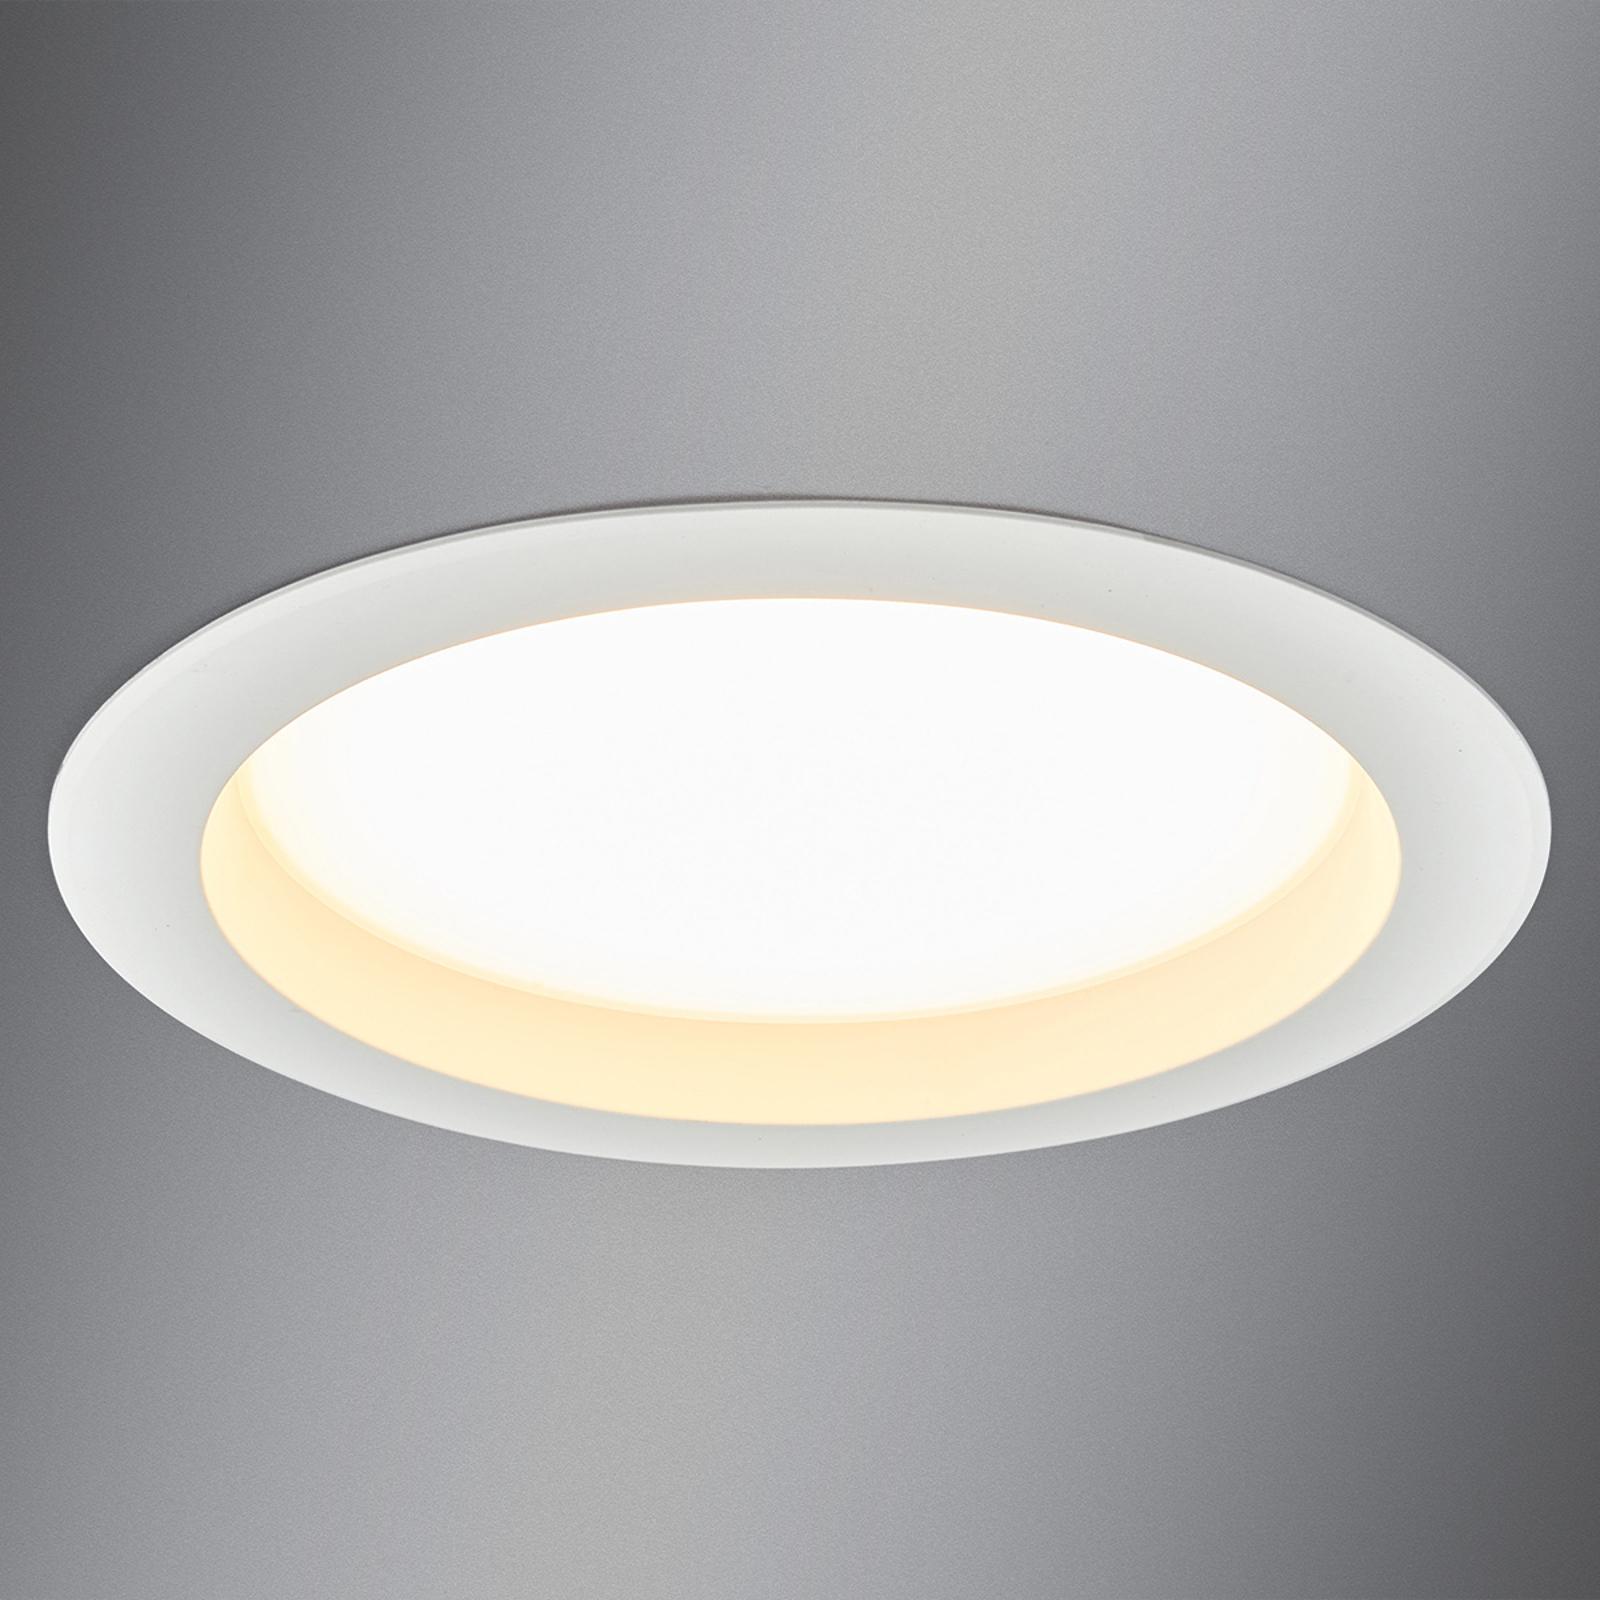 Duży downlight LED ARIAN, 24,4 cm